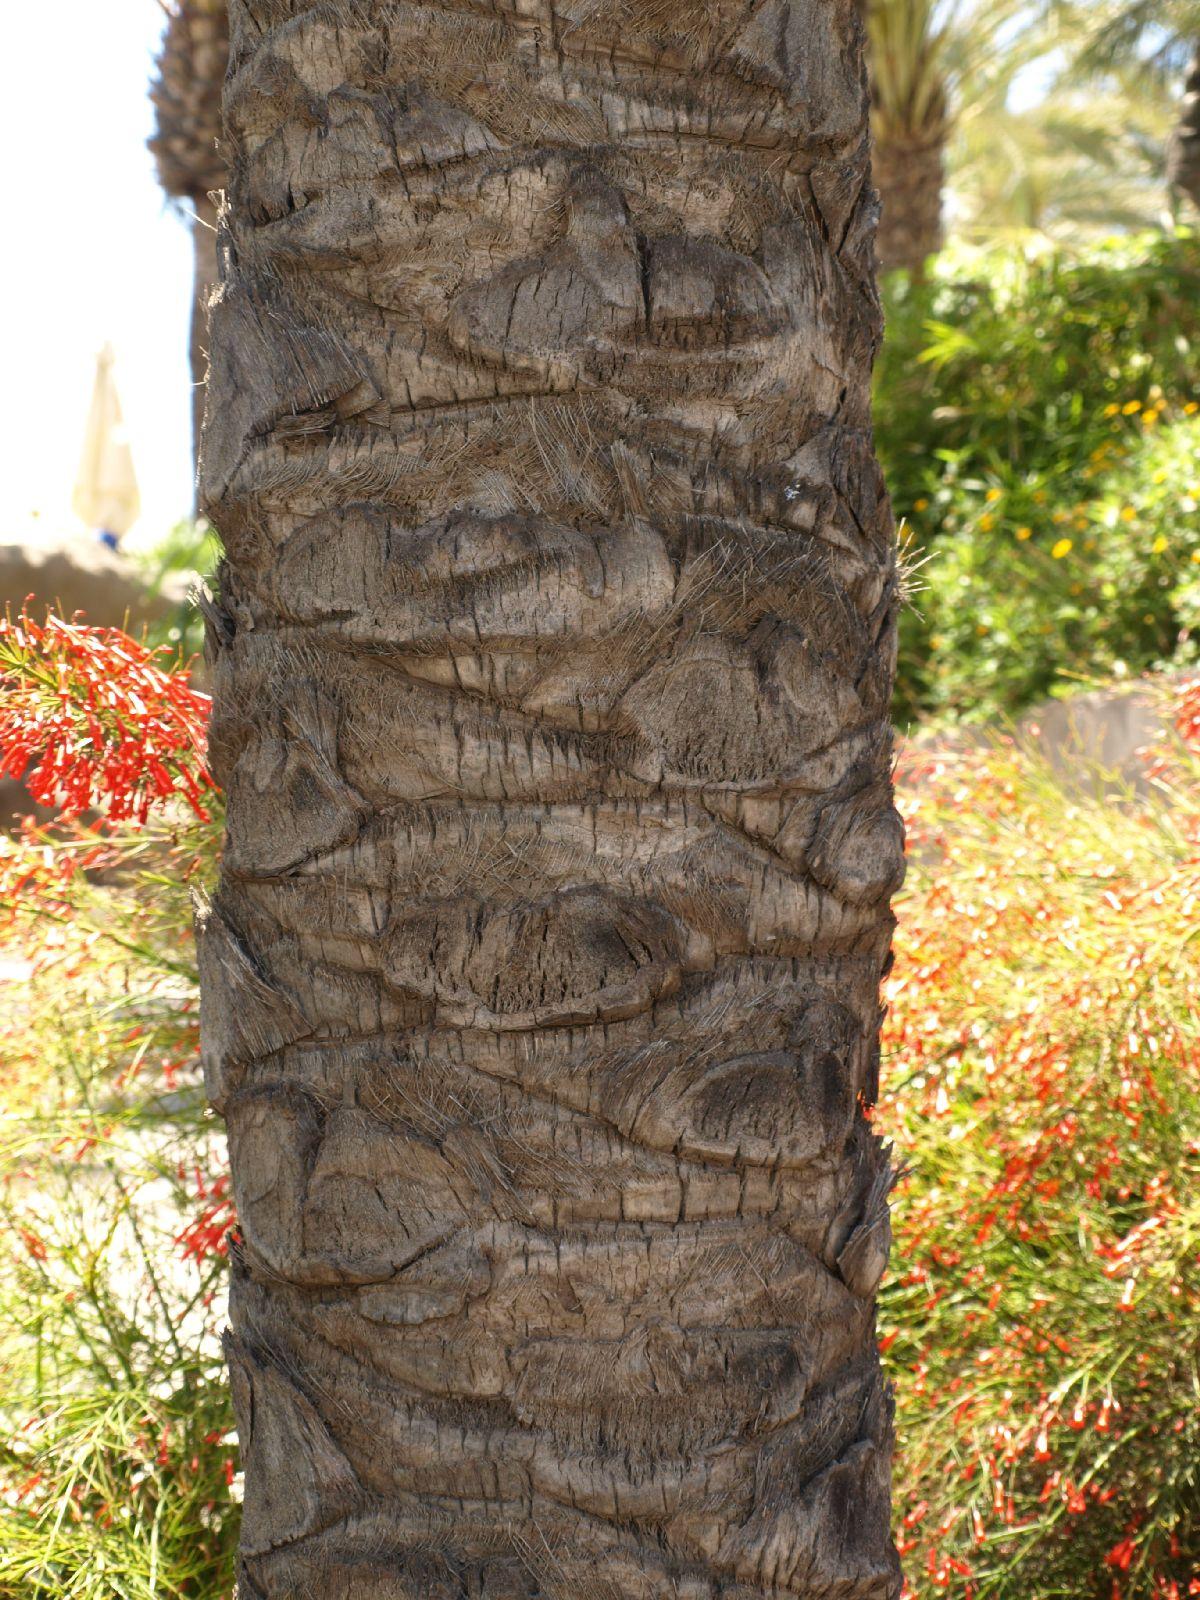 Baum-Rinde_Textur_A_P5224349